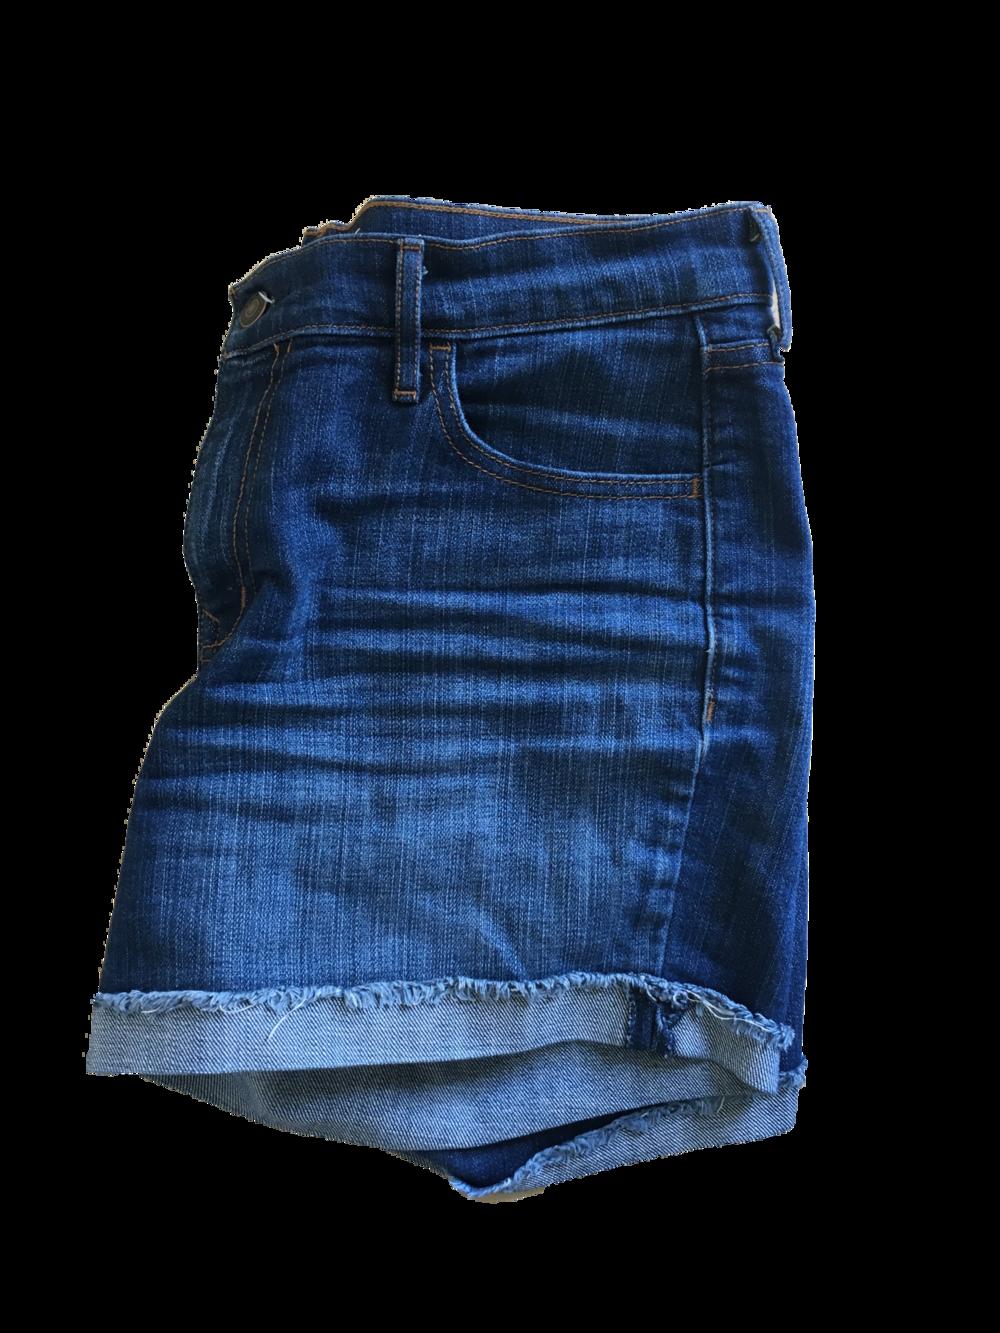 Jean Shorts.png